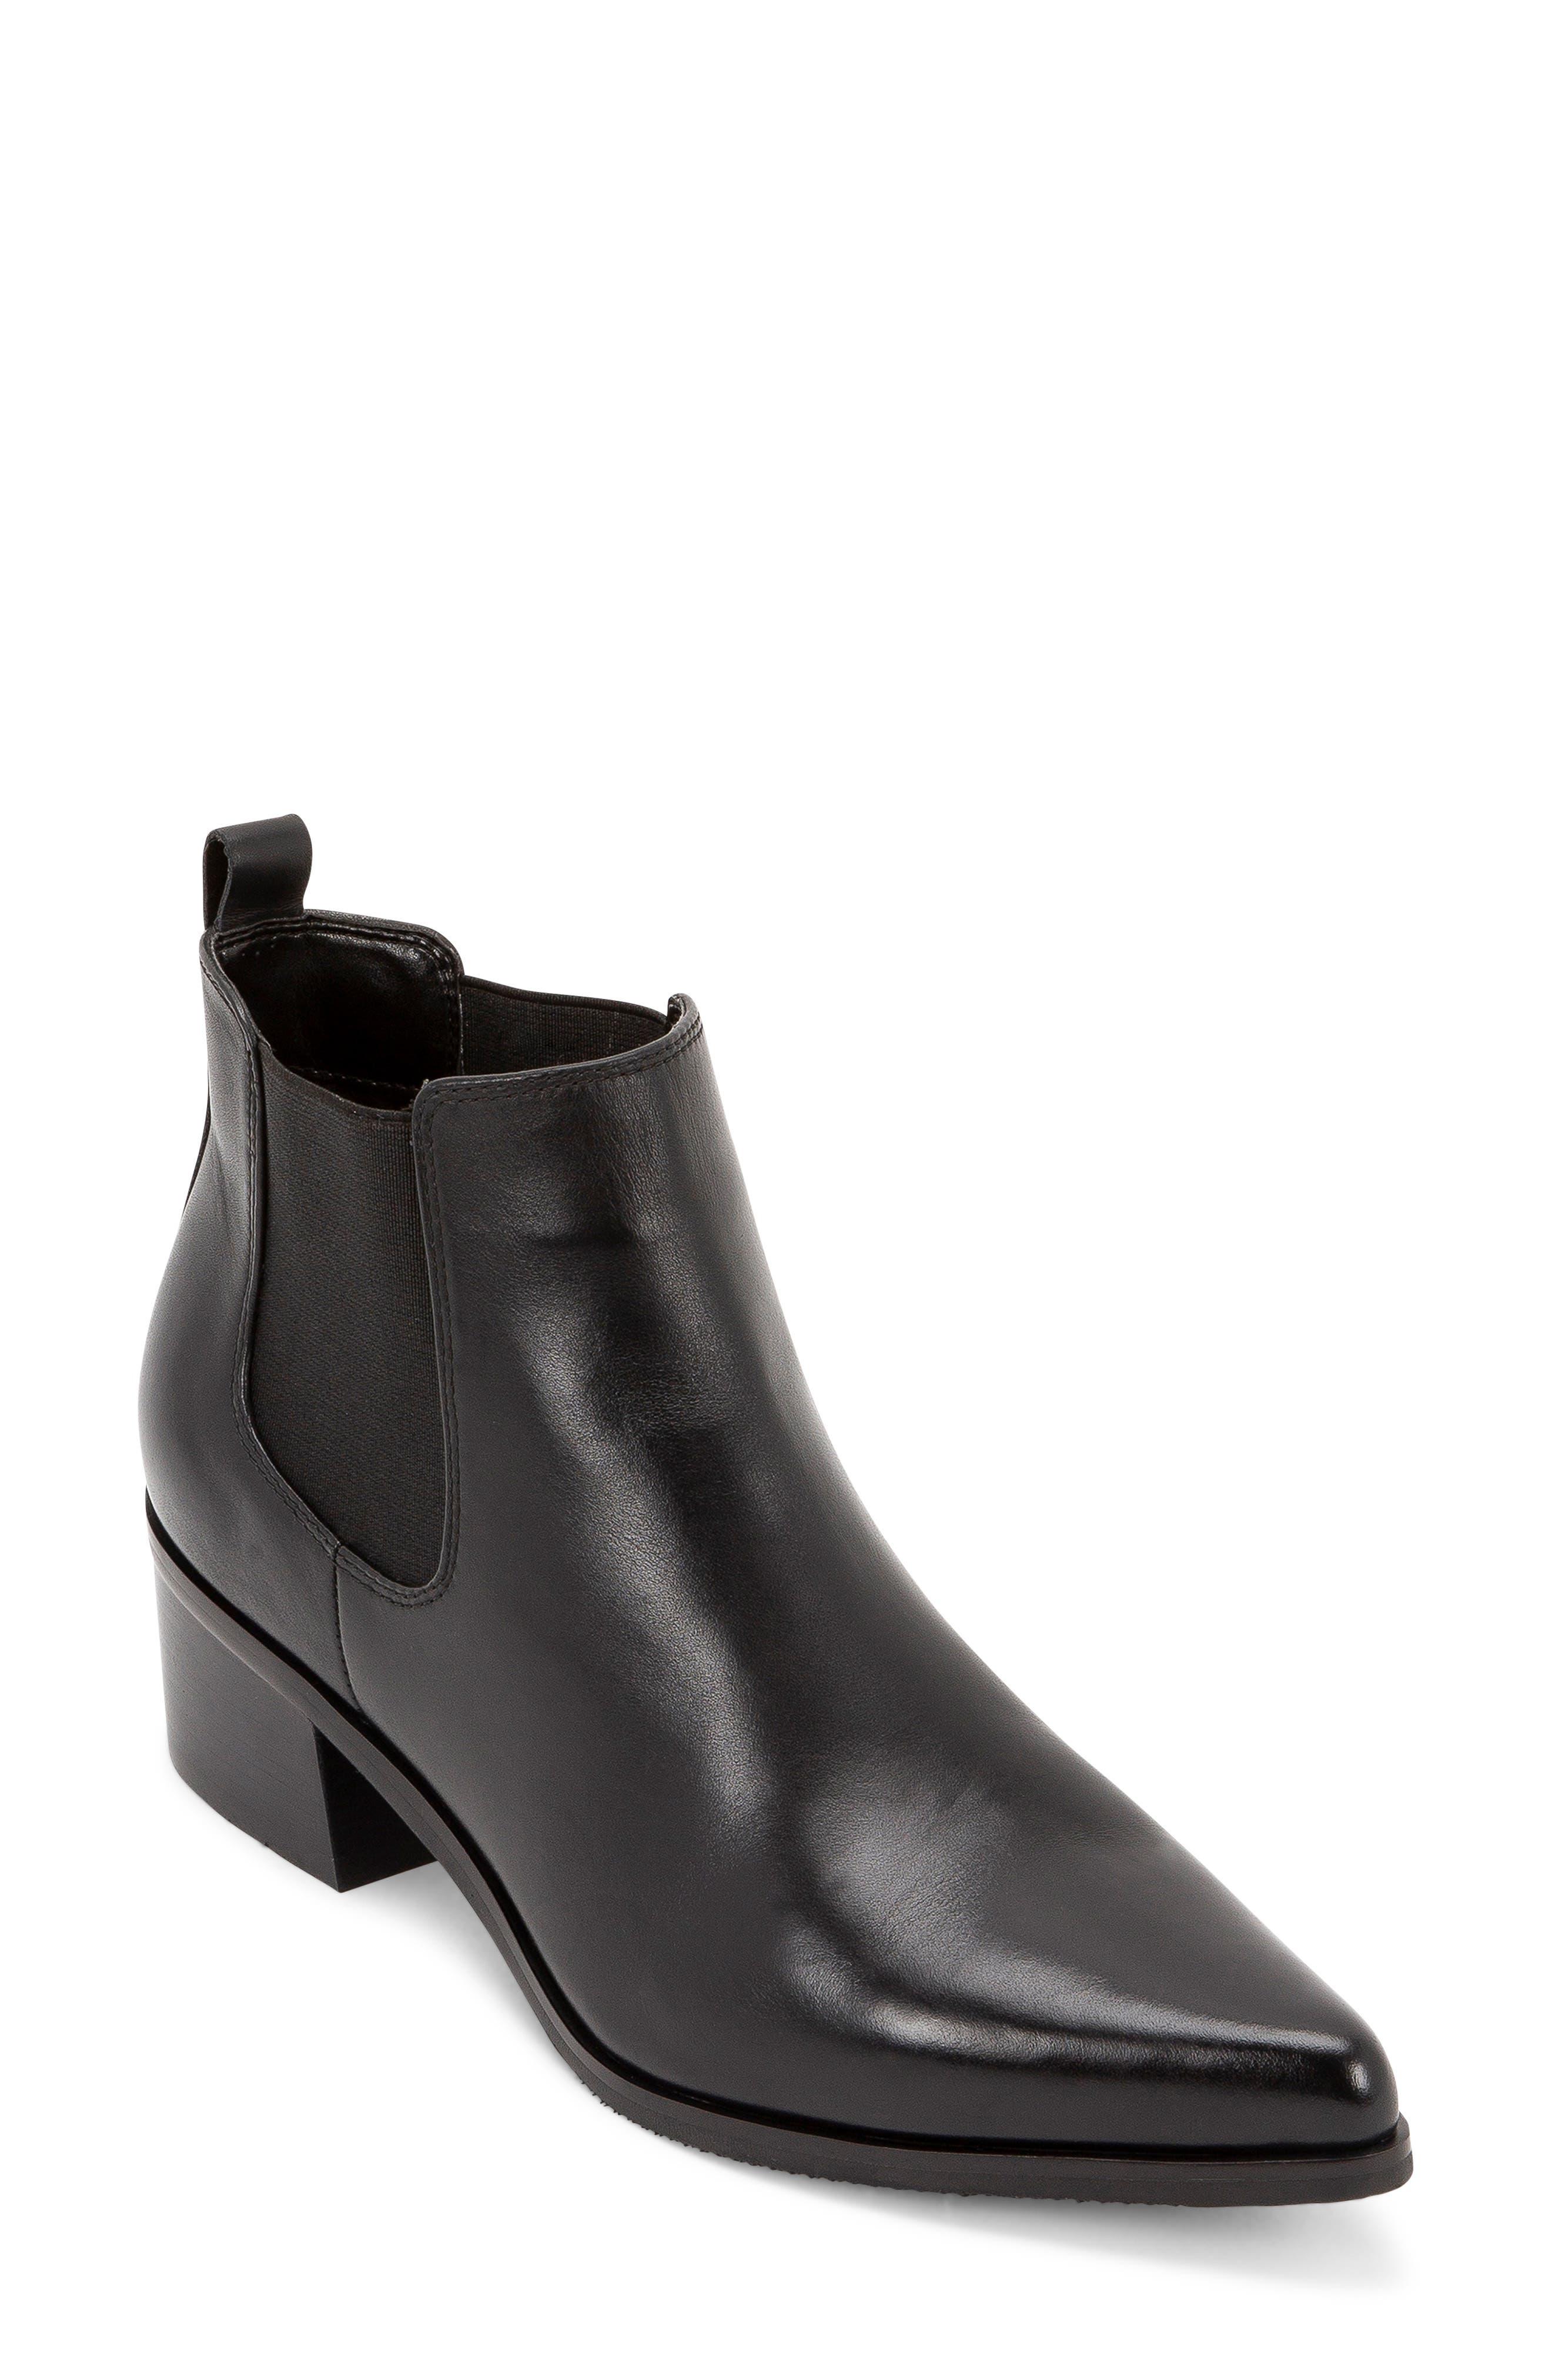 Blondo | Emelia Waterproof Boot